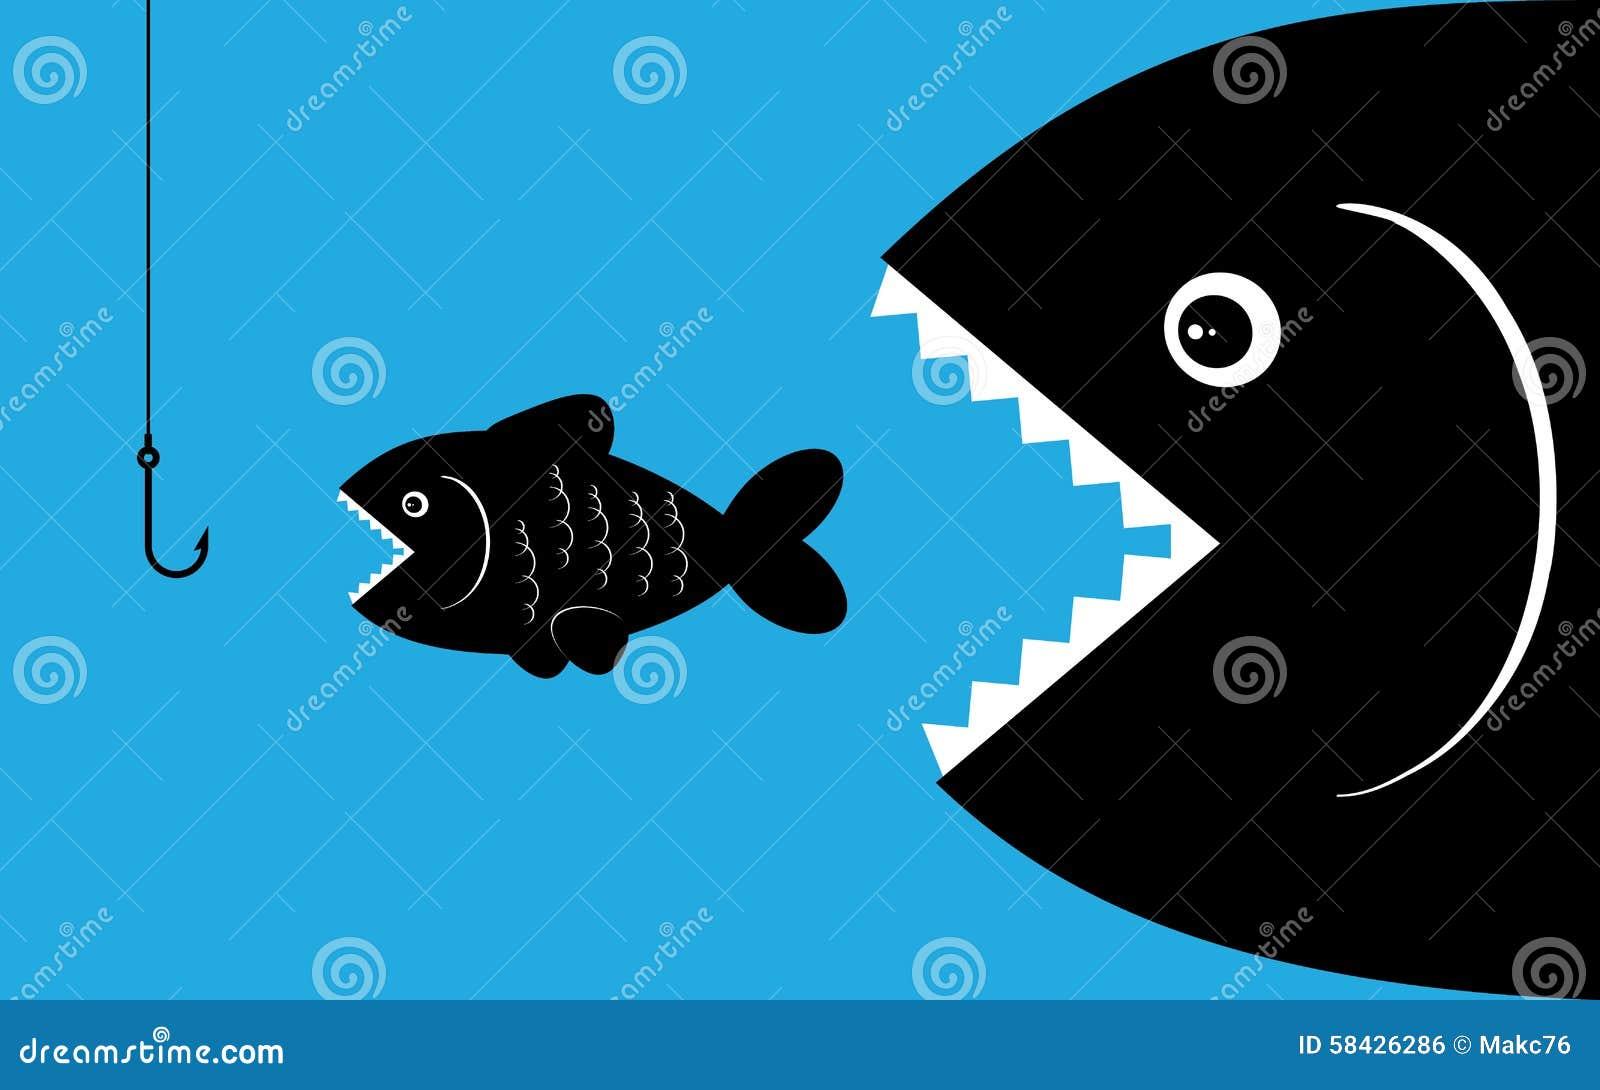 Big Fish With Bait Stock Vector Illustration Of Fish 58426286